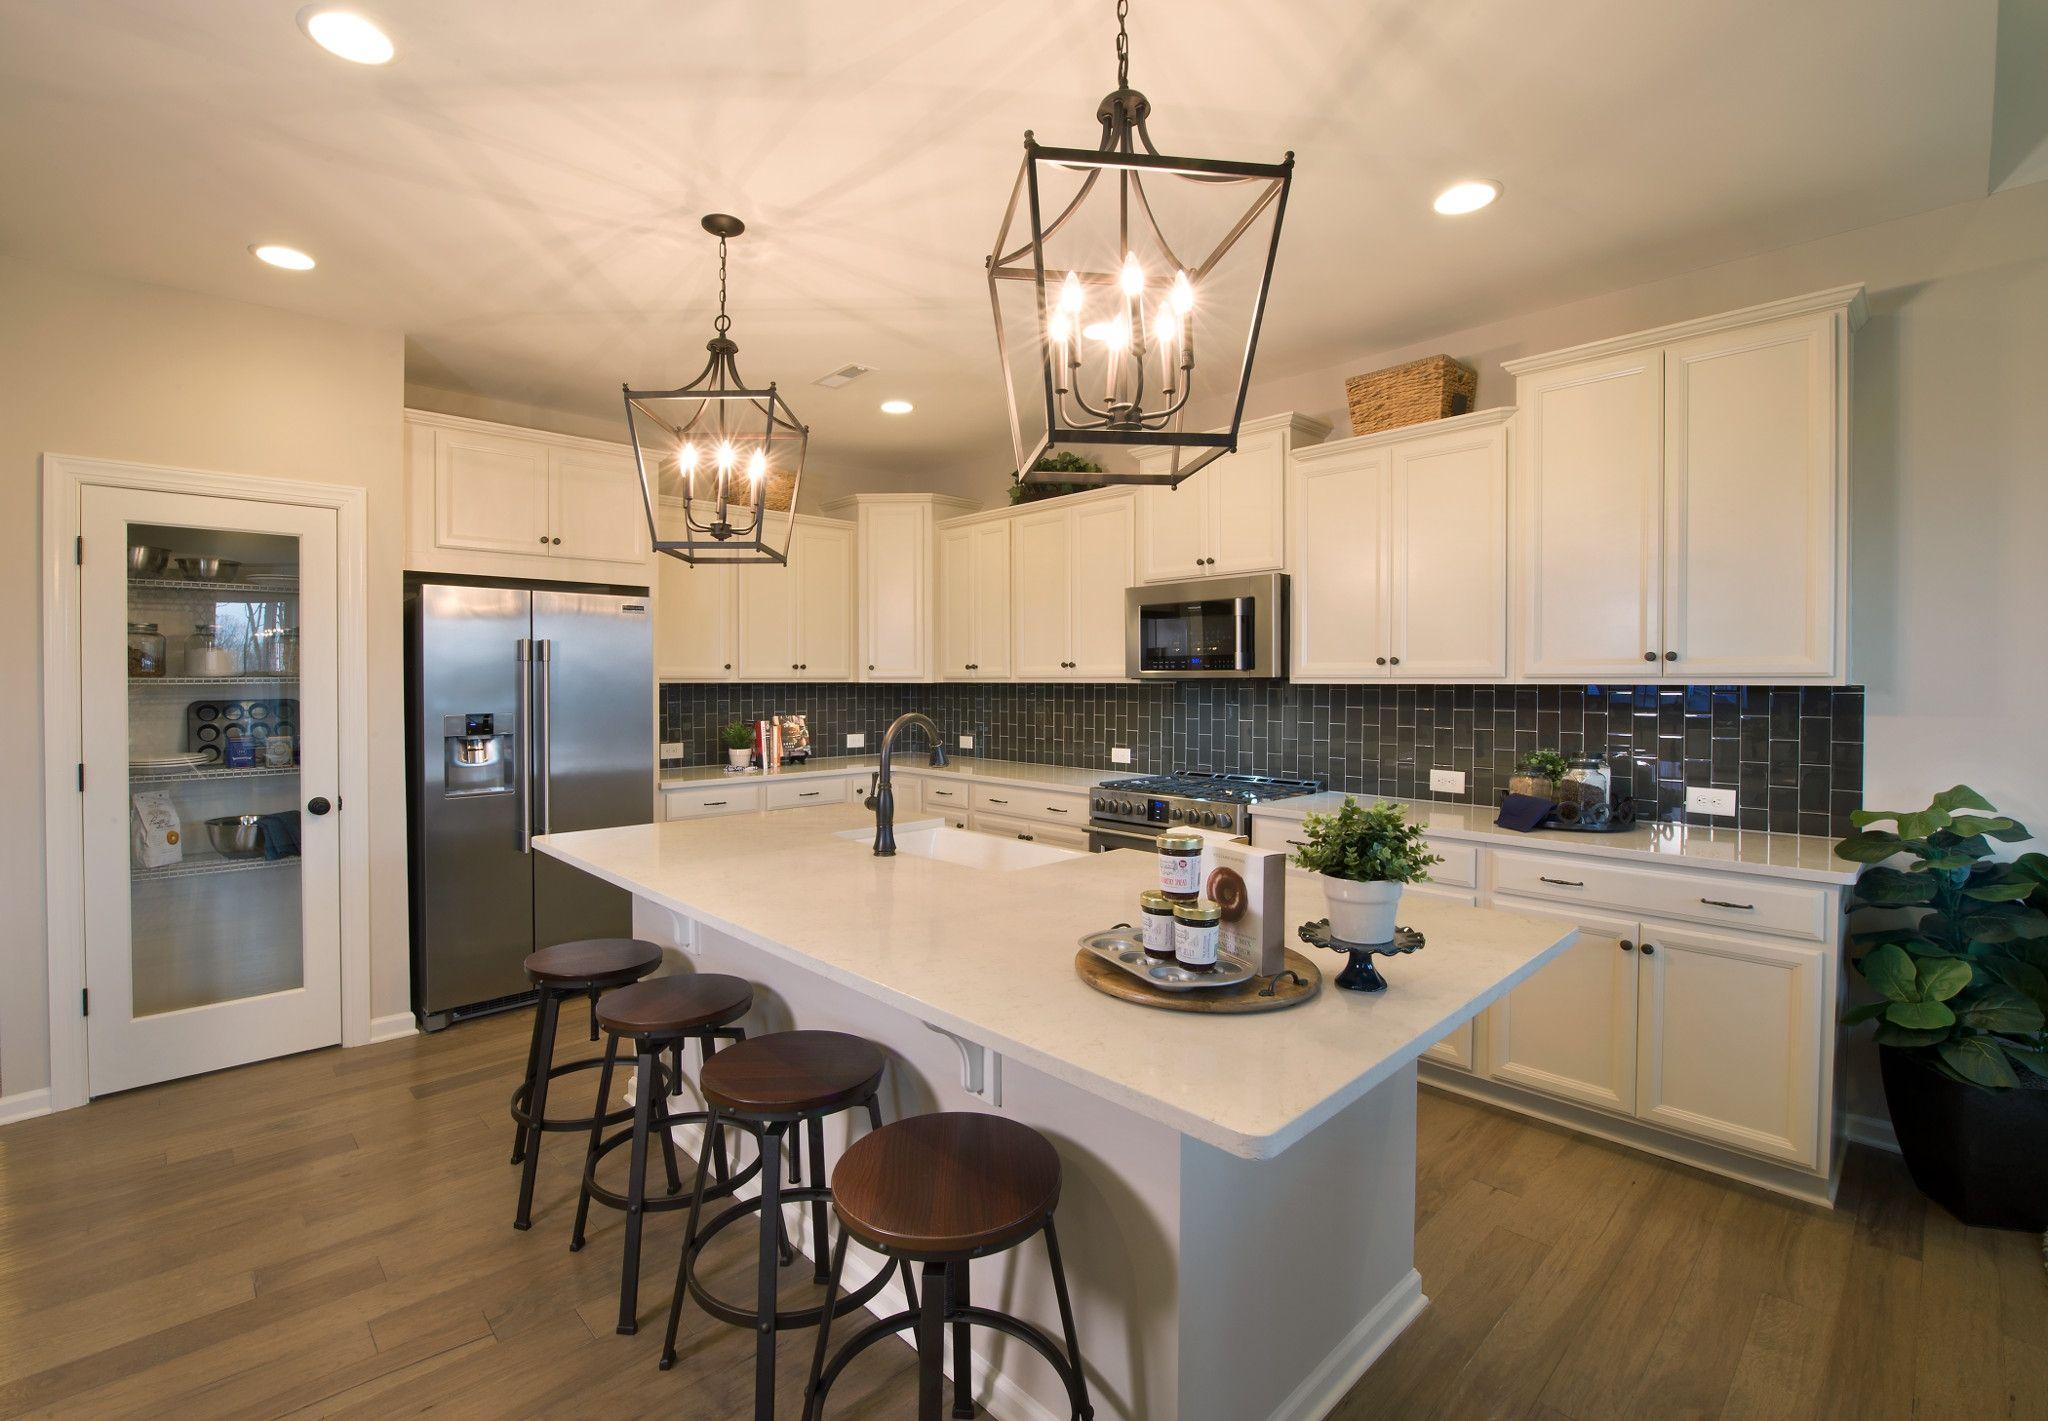 Kitchen-in-Everett-at-Killian's Pointe - Vintage-in-Denver